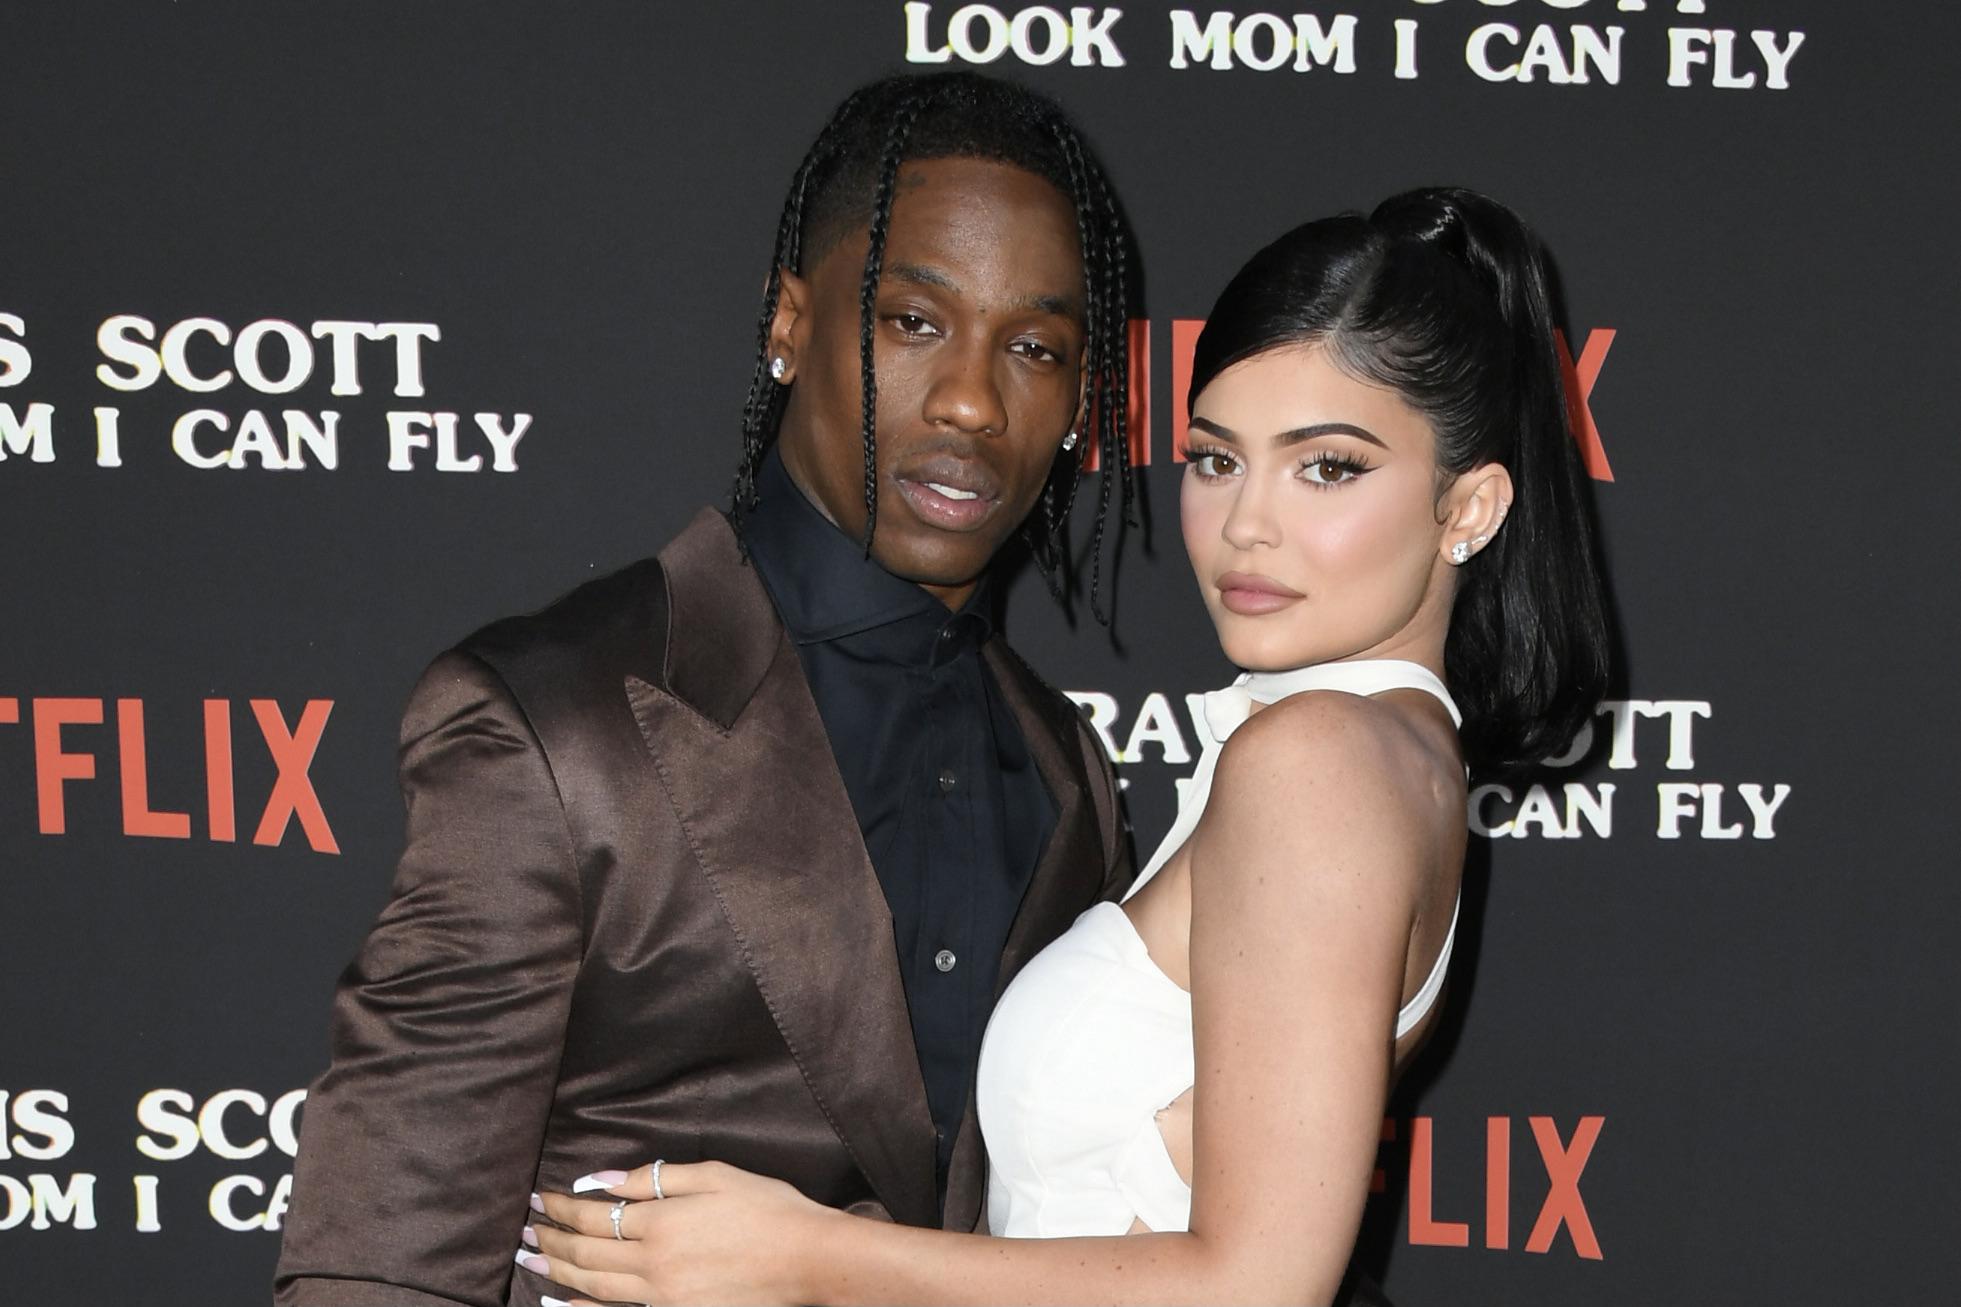 Travis Scott and Kylie Jenner